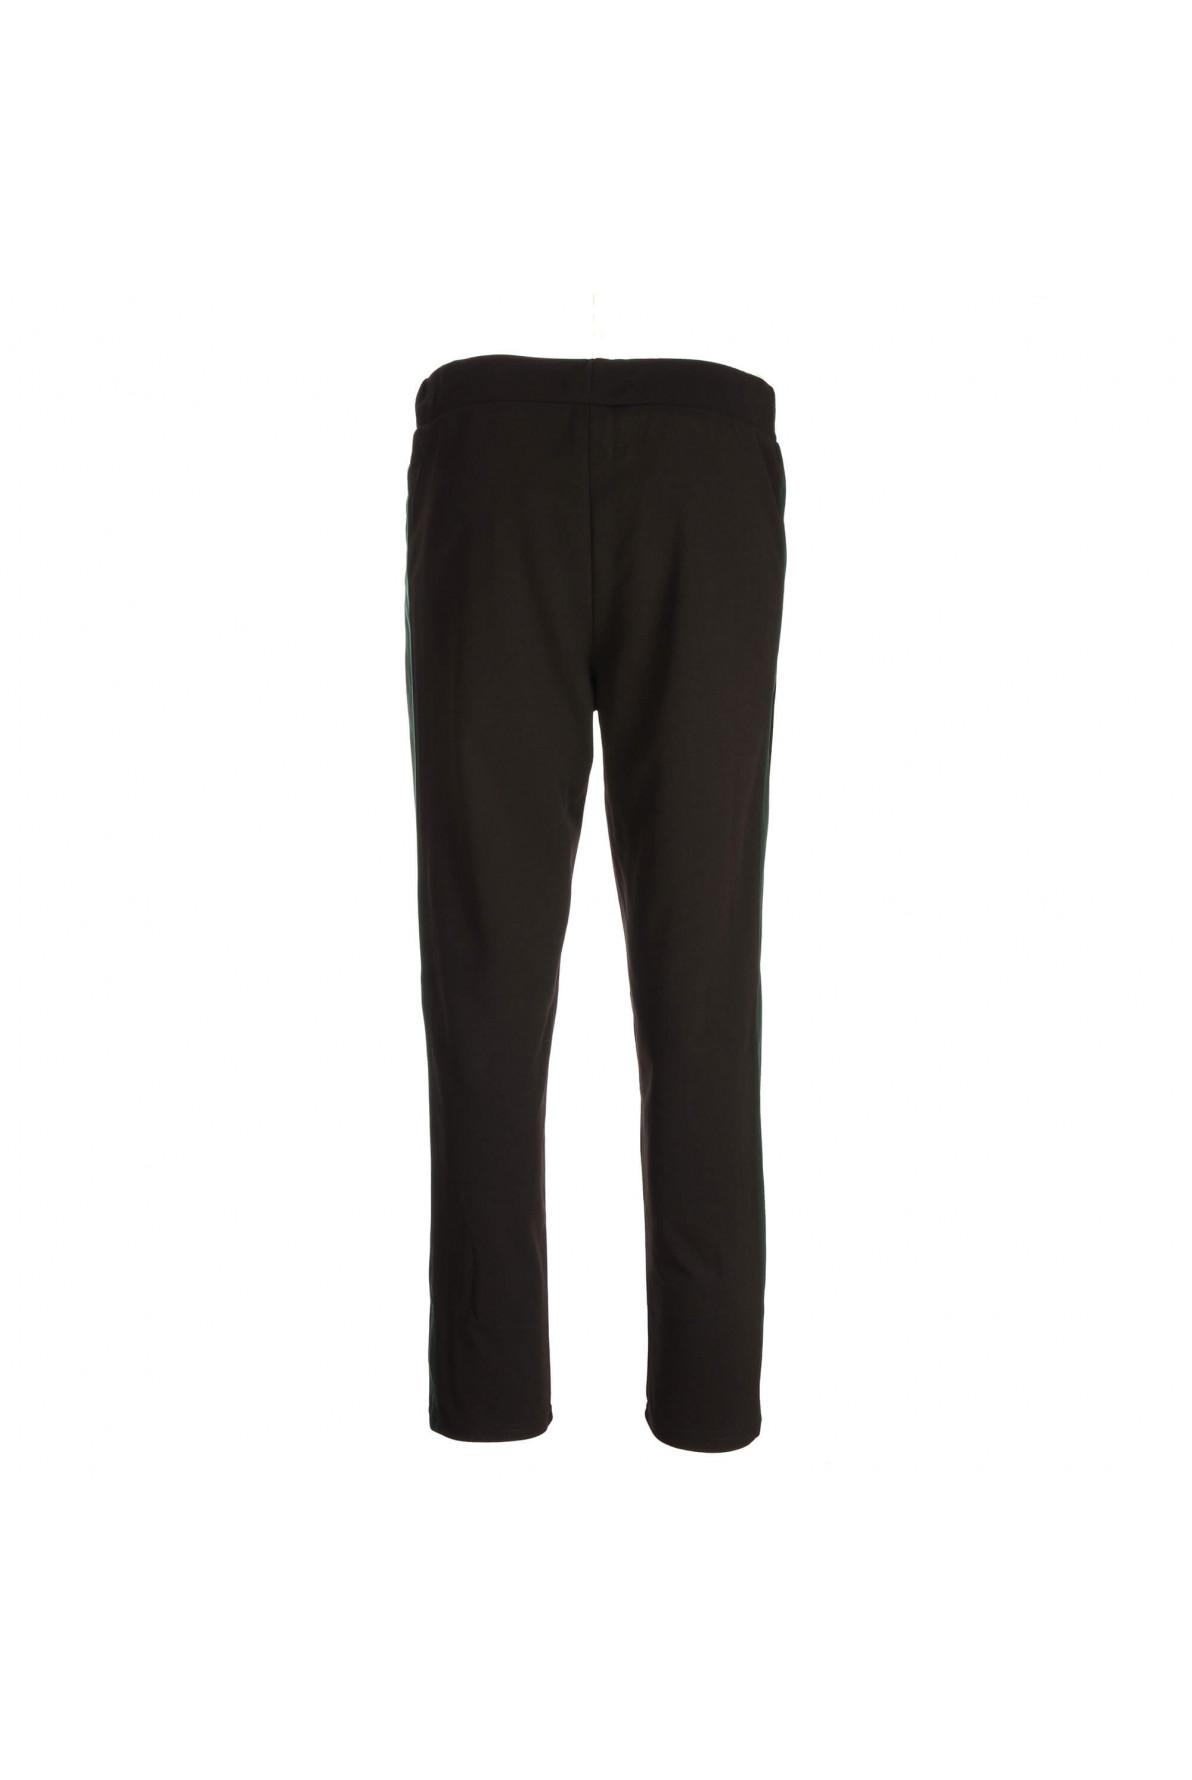 Pantalon fluide 2 bandes